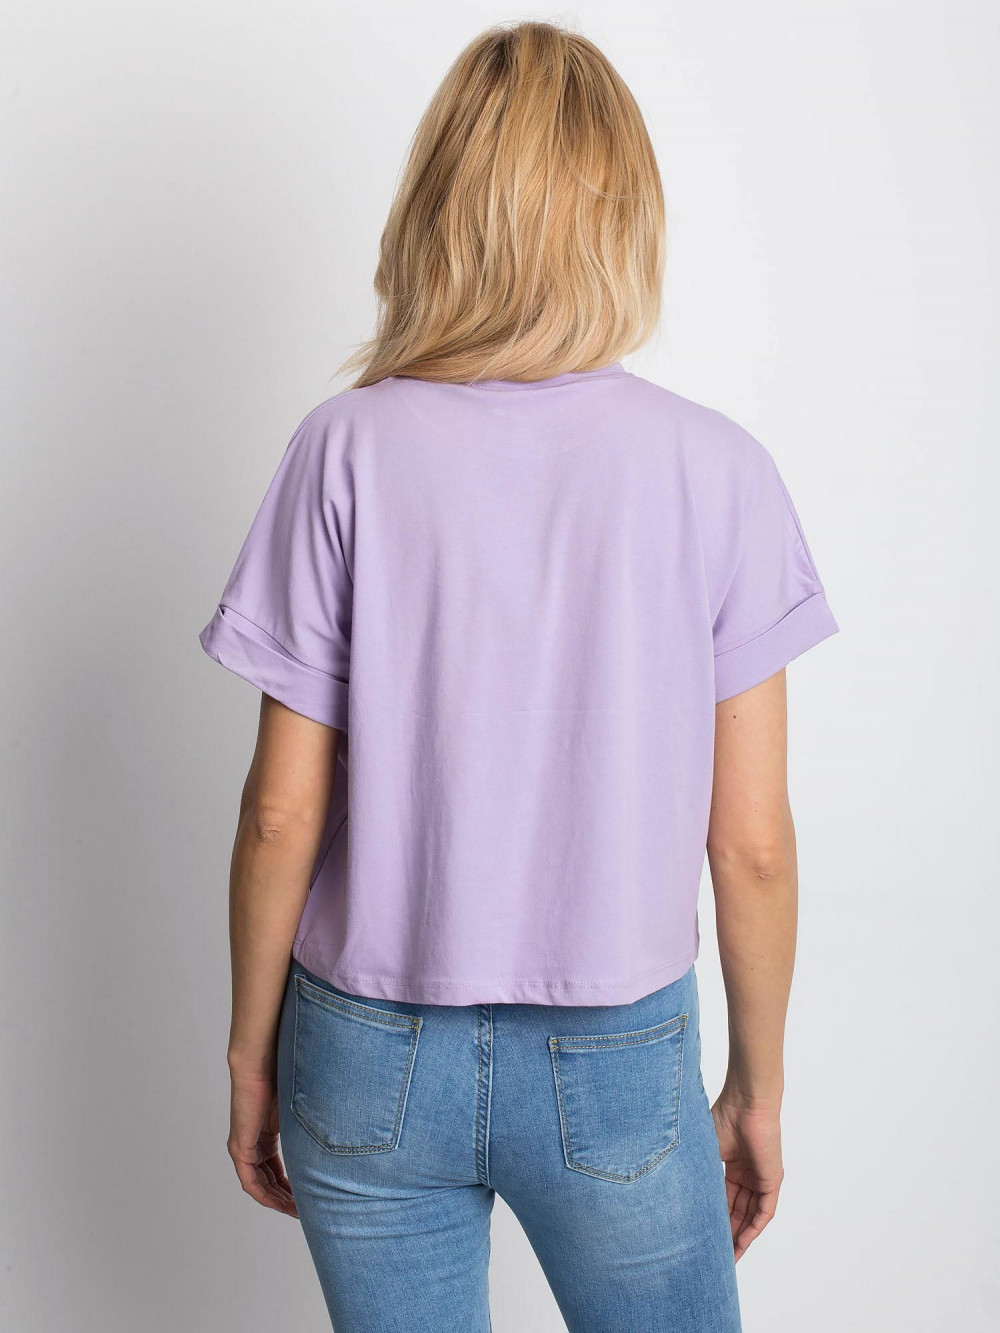 Jasnofioletowy luźny t-shirt Blink 4